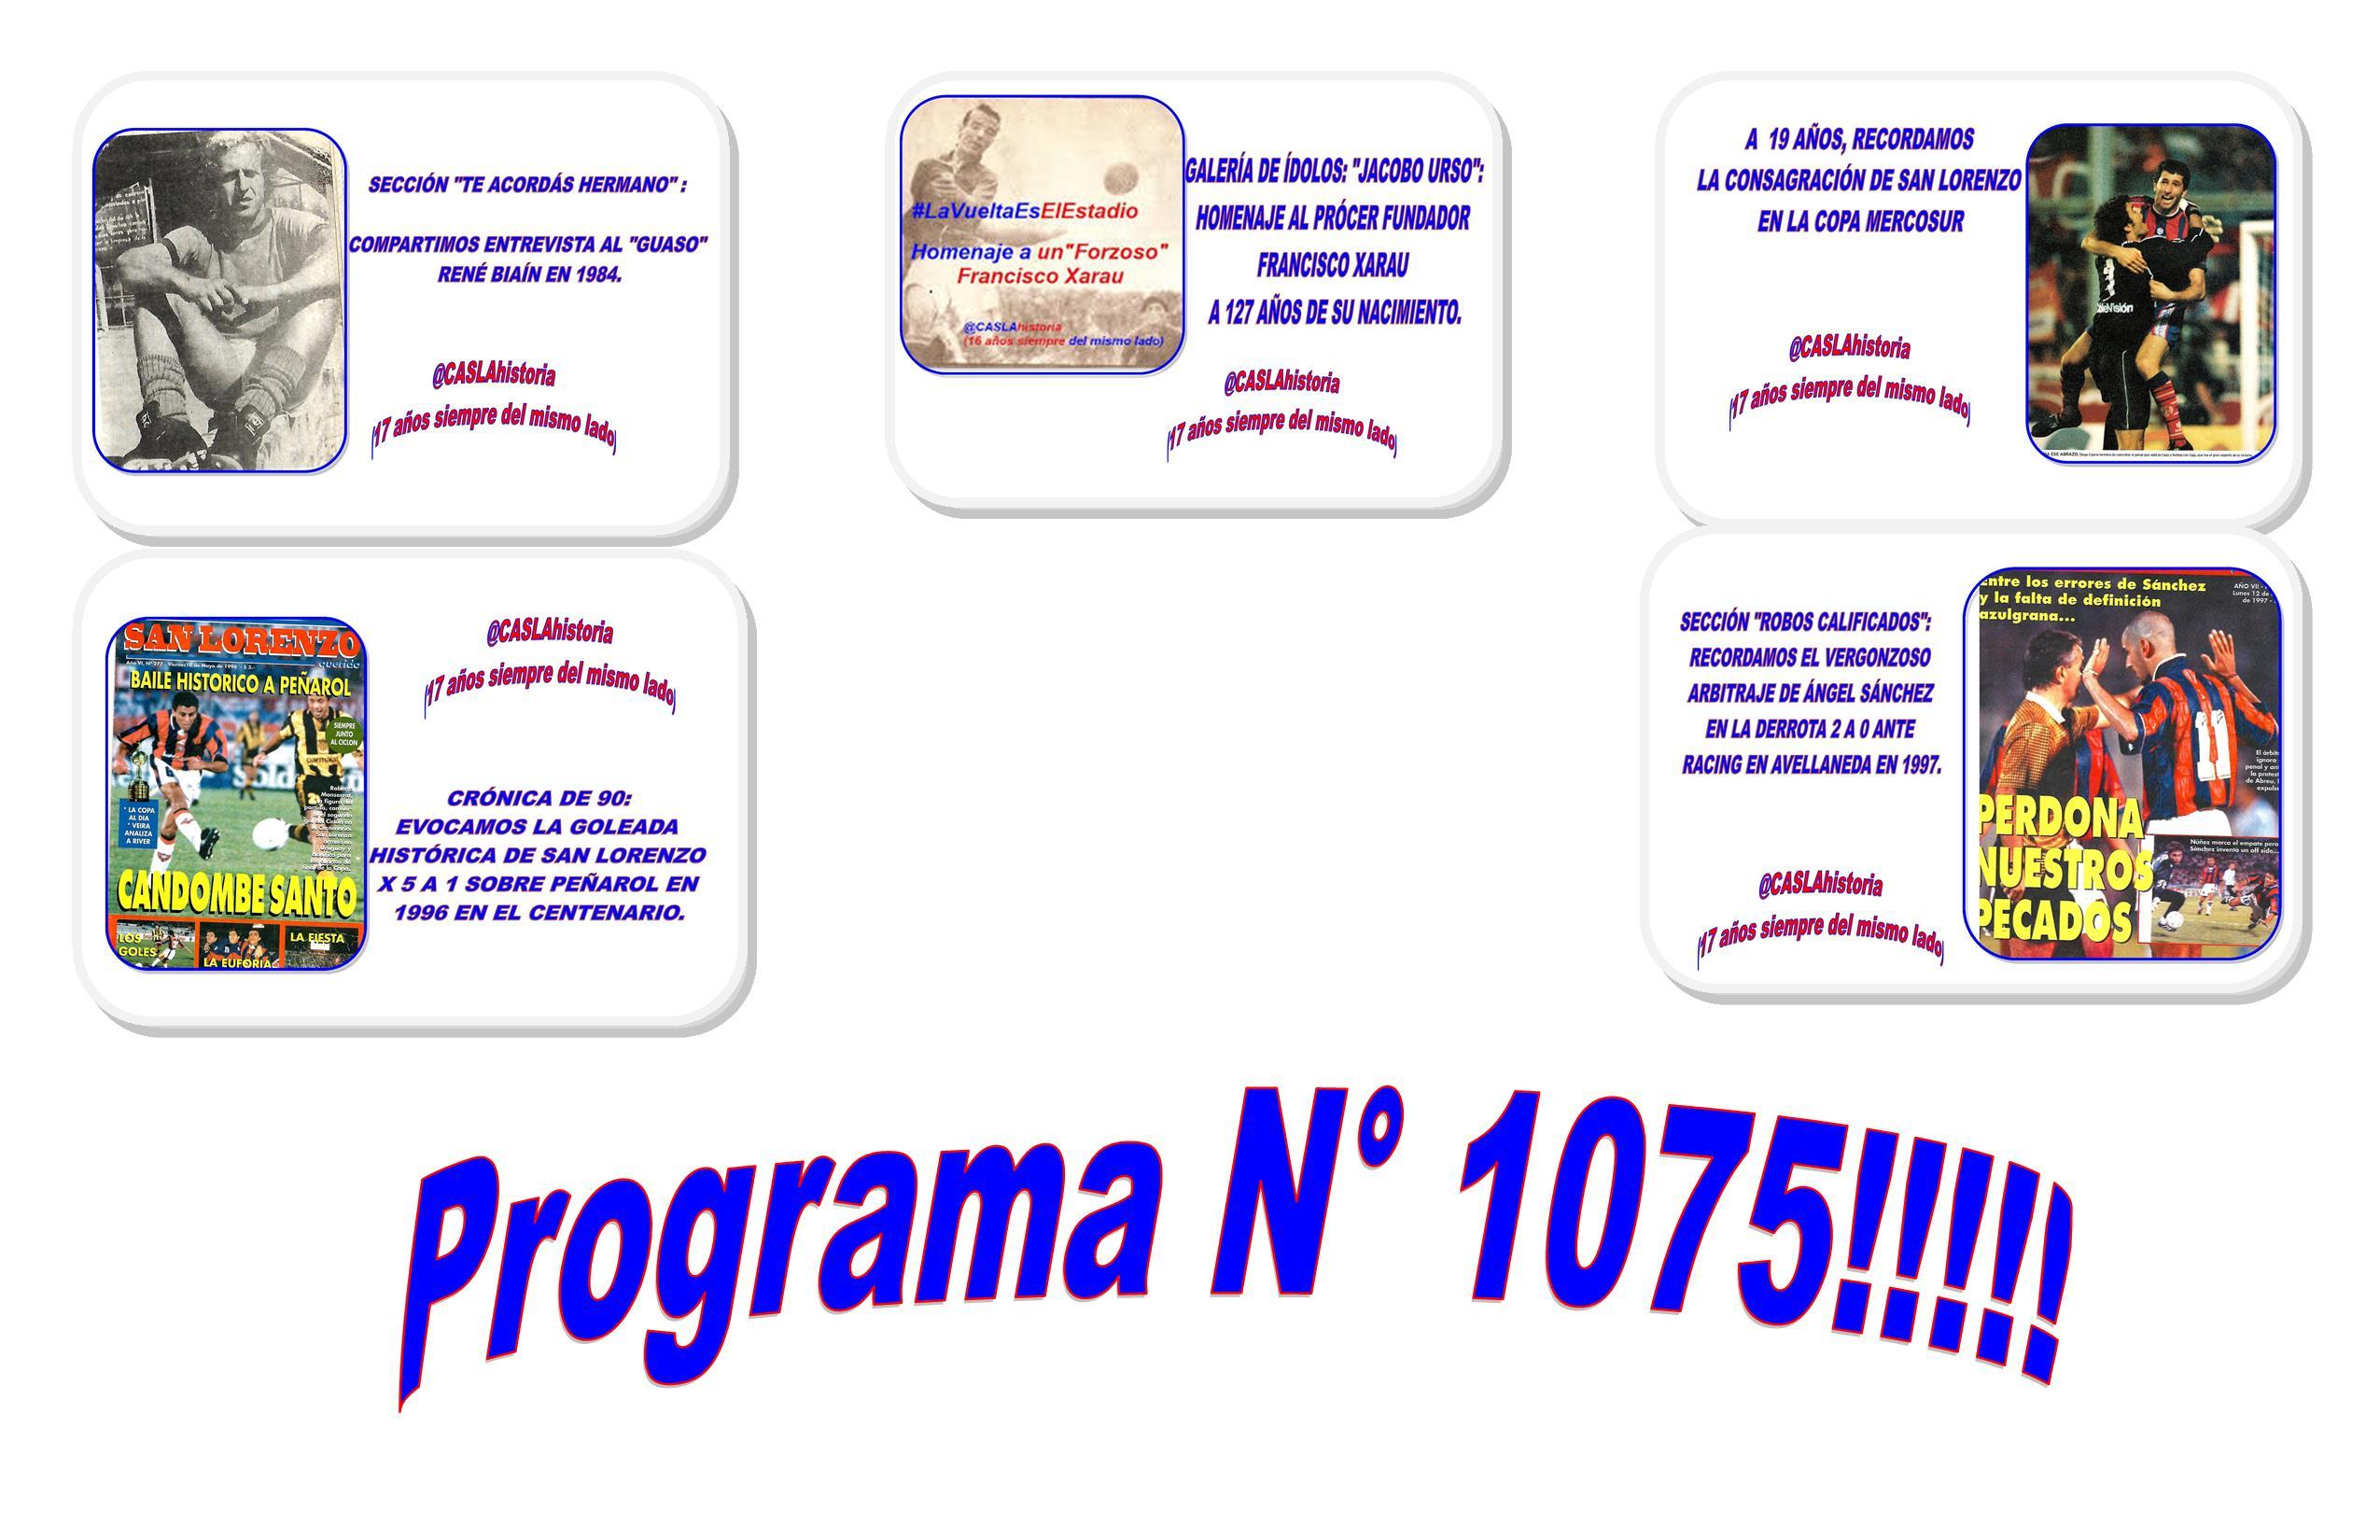 Programa N° 1075!!.»Mercosur, Francisco Xarau,Osvaldo  Biain,Angel Sanchez……..»